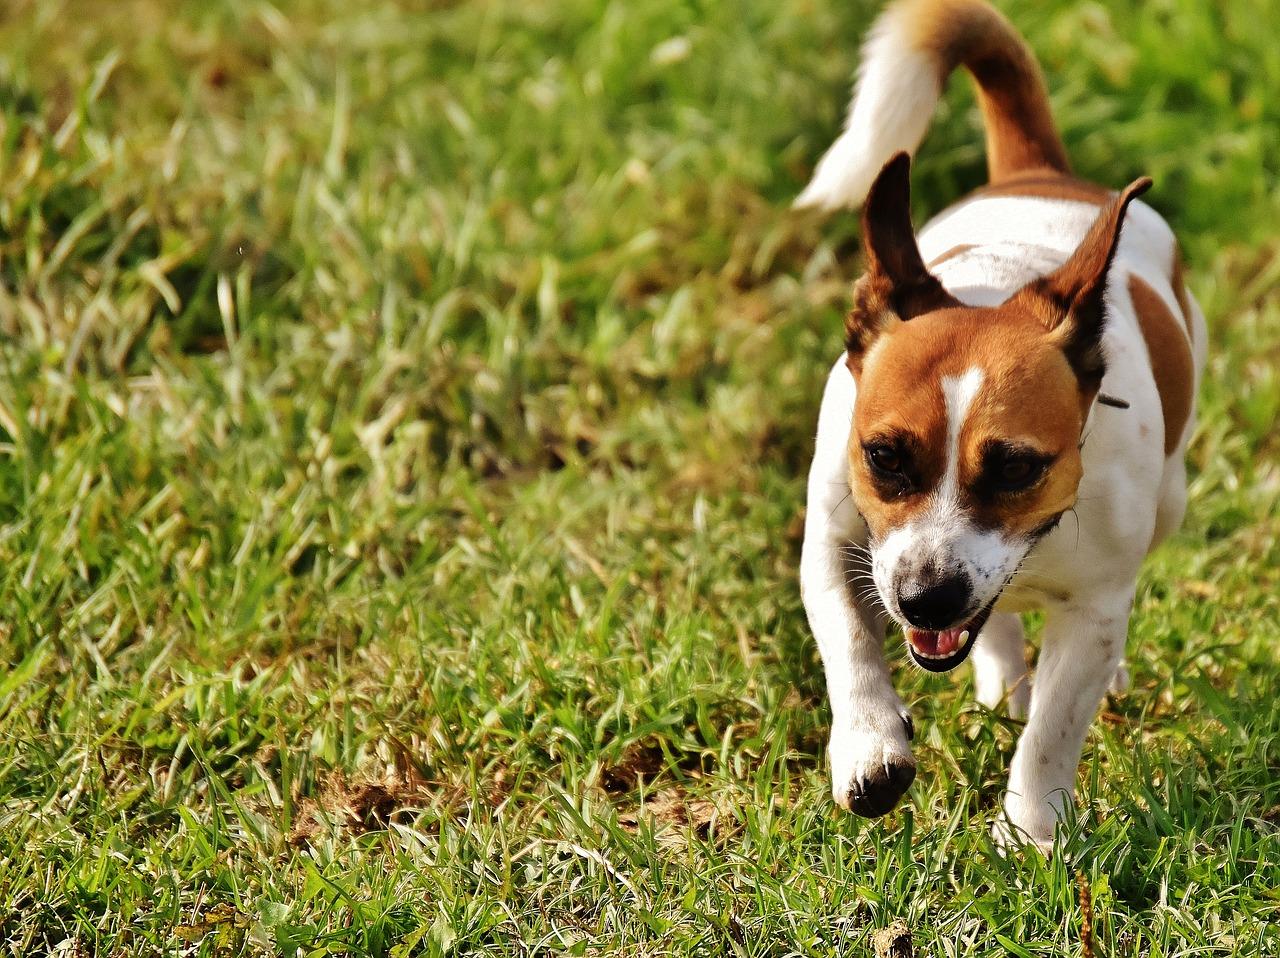 jack russell terrier running outdoor in grass